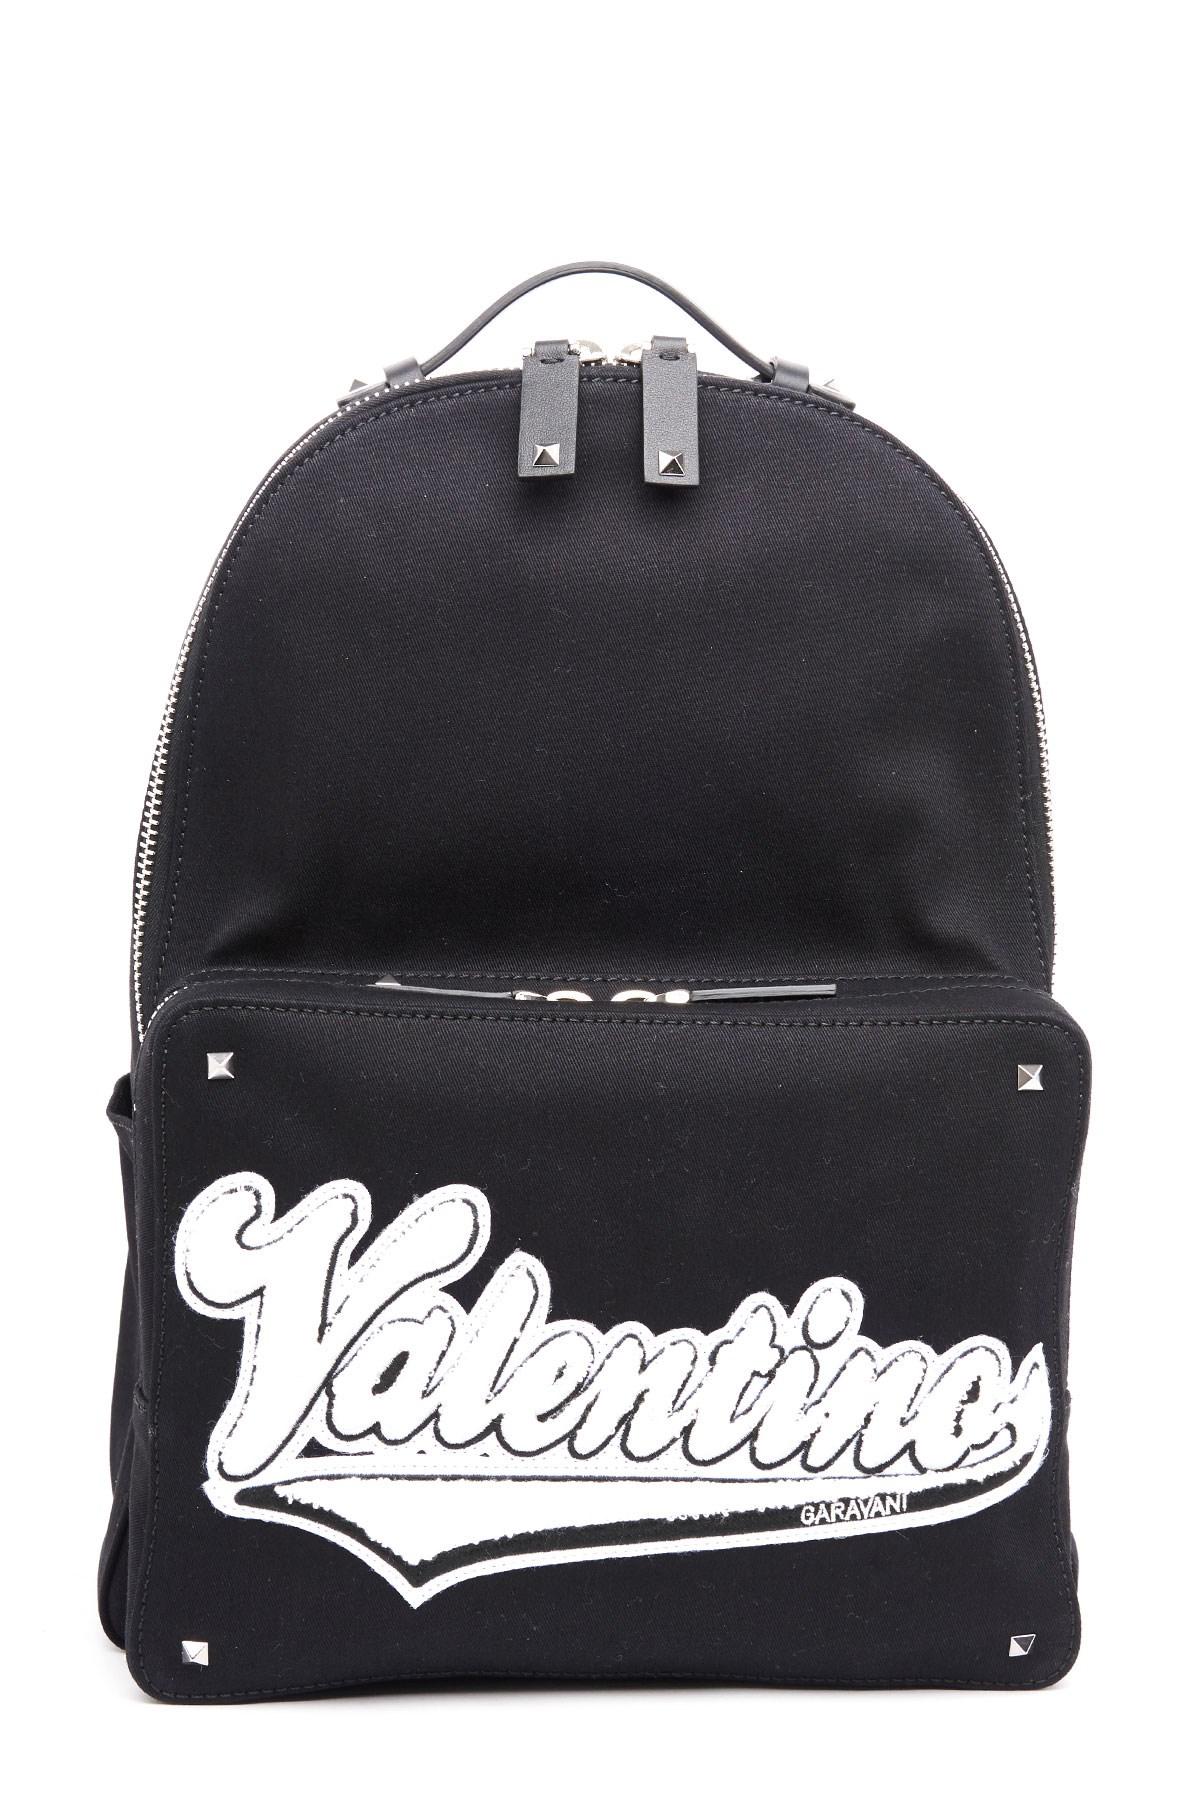 valentino garavani patch logo backpack available on julian-fashion ... 71506ba0f44a4